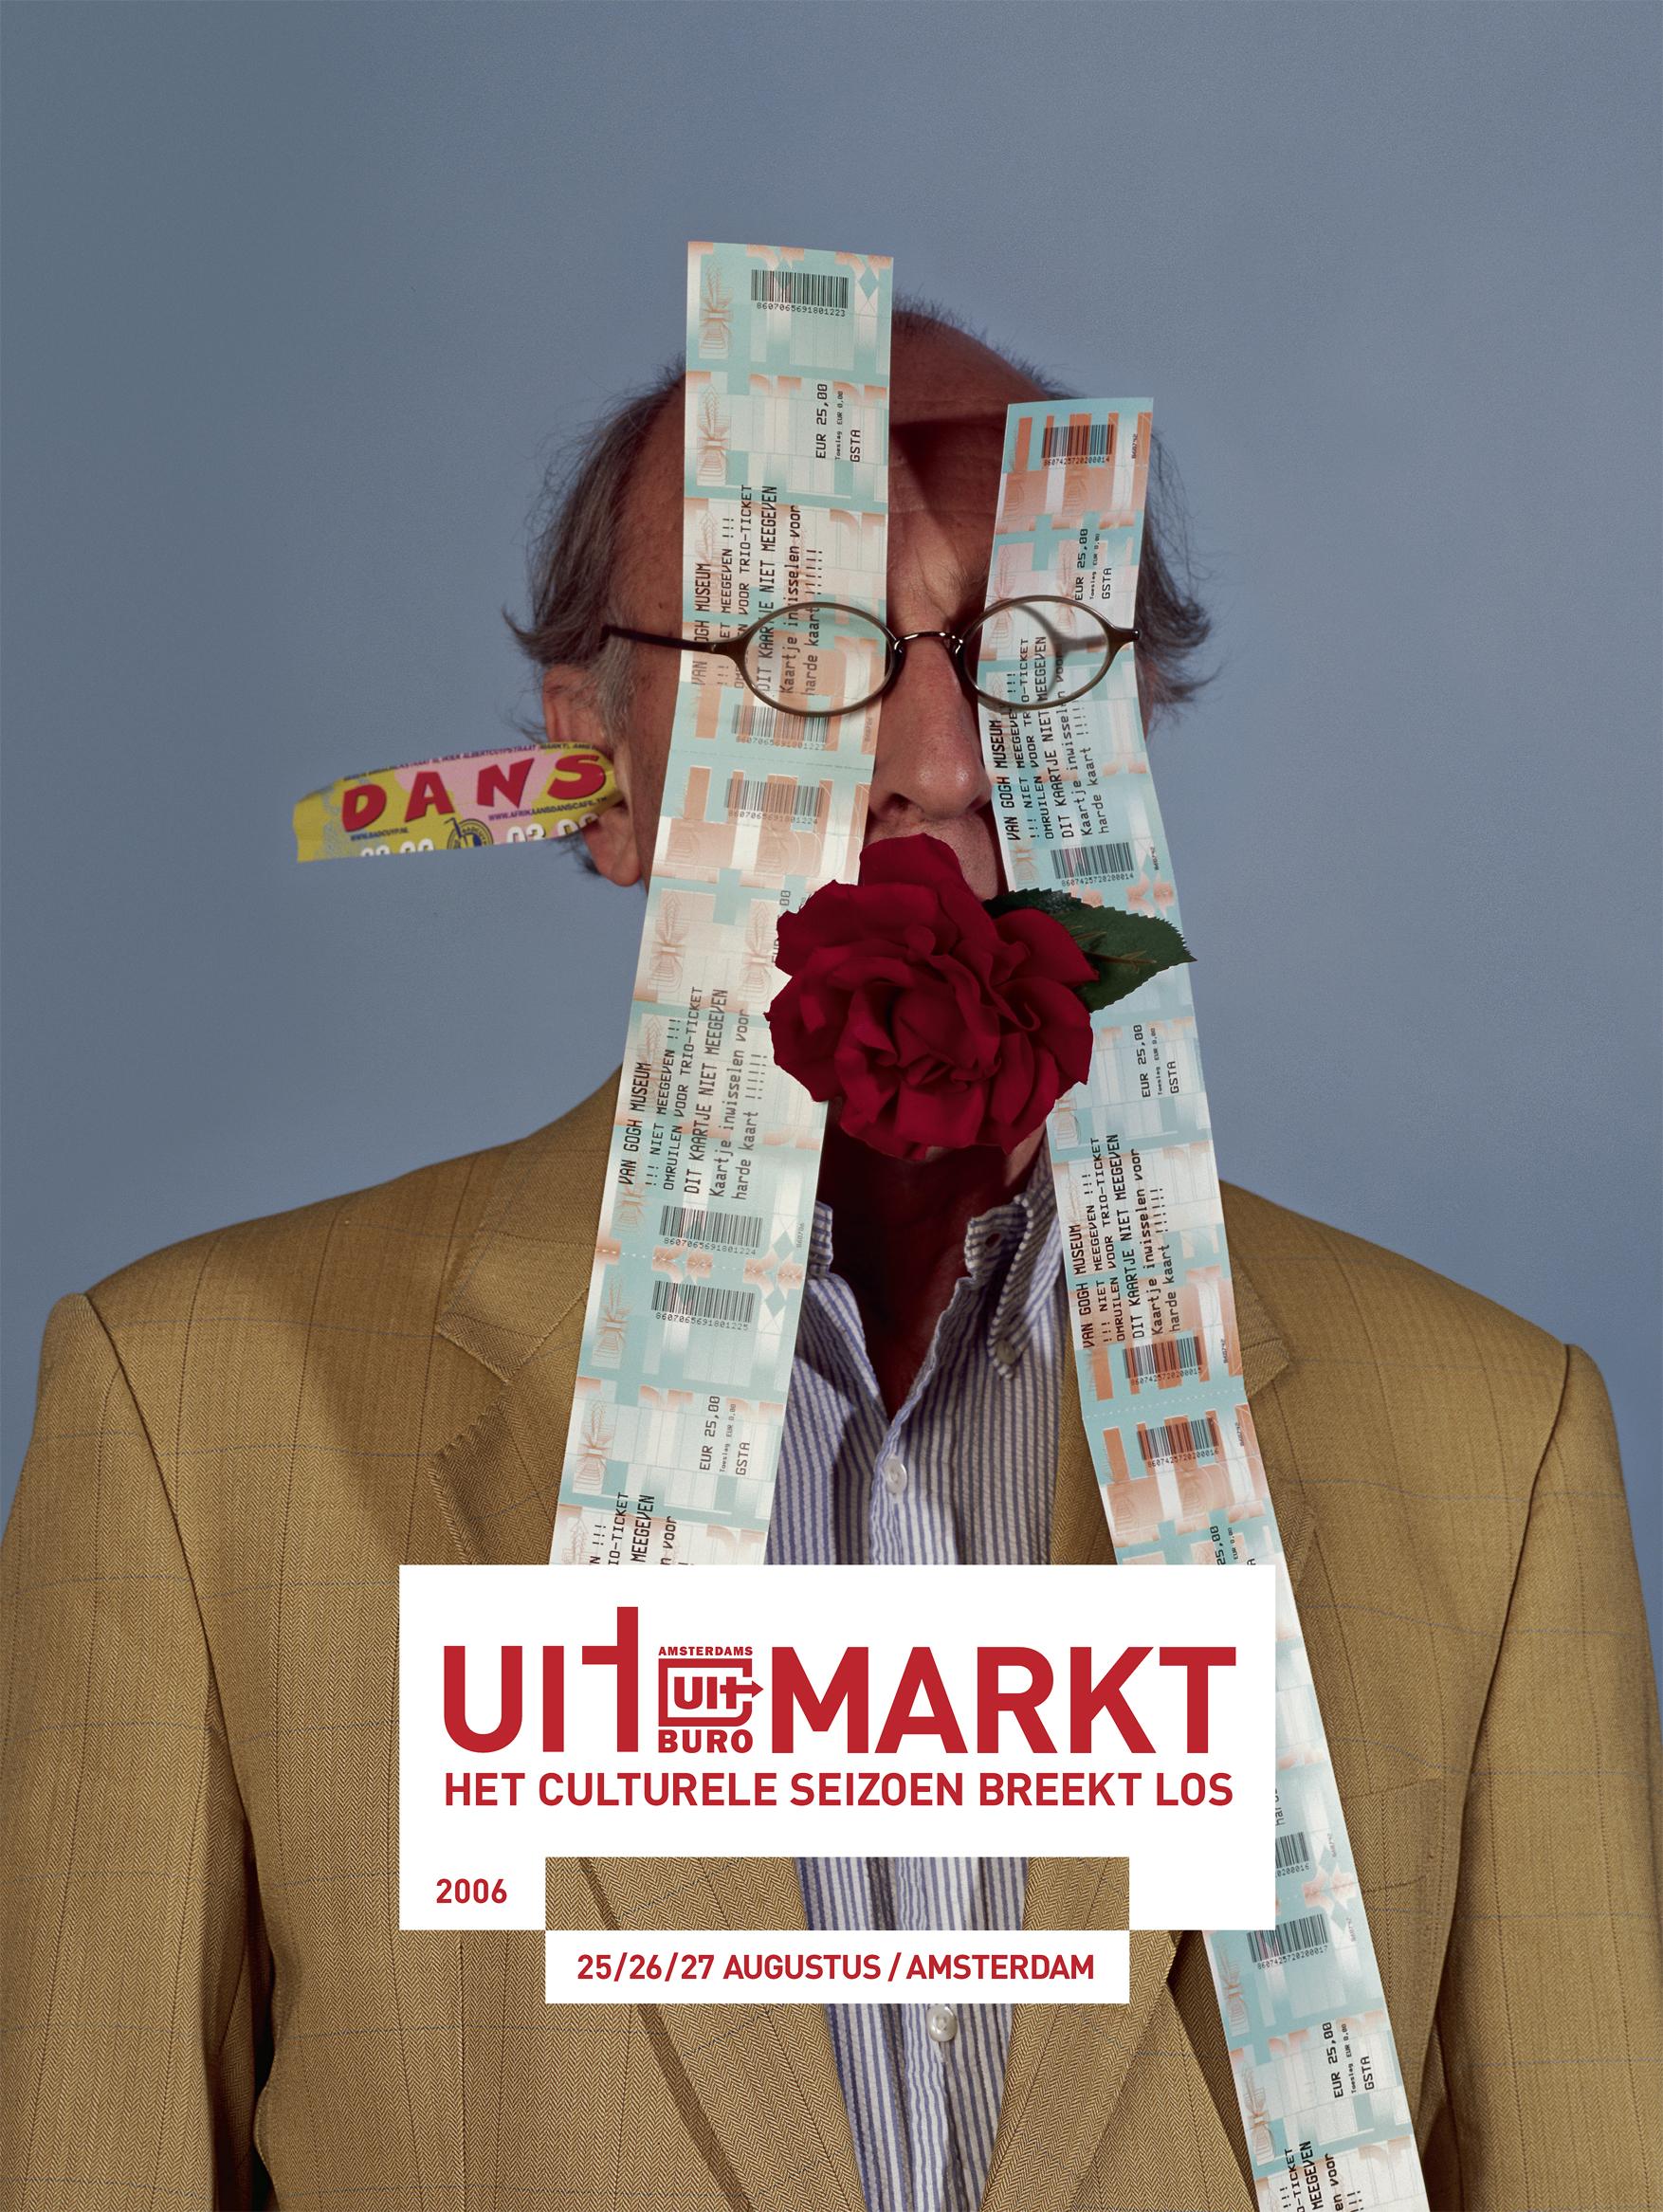 Uitmarkt_4b.jpg